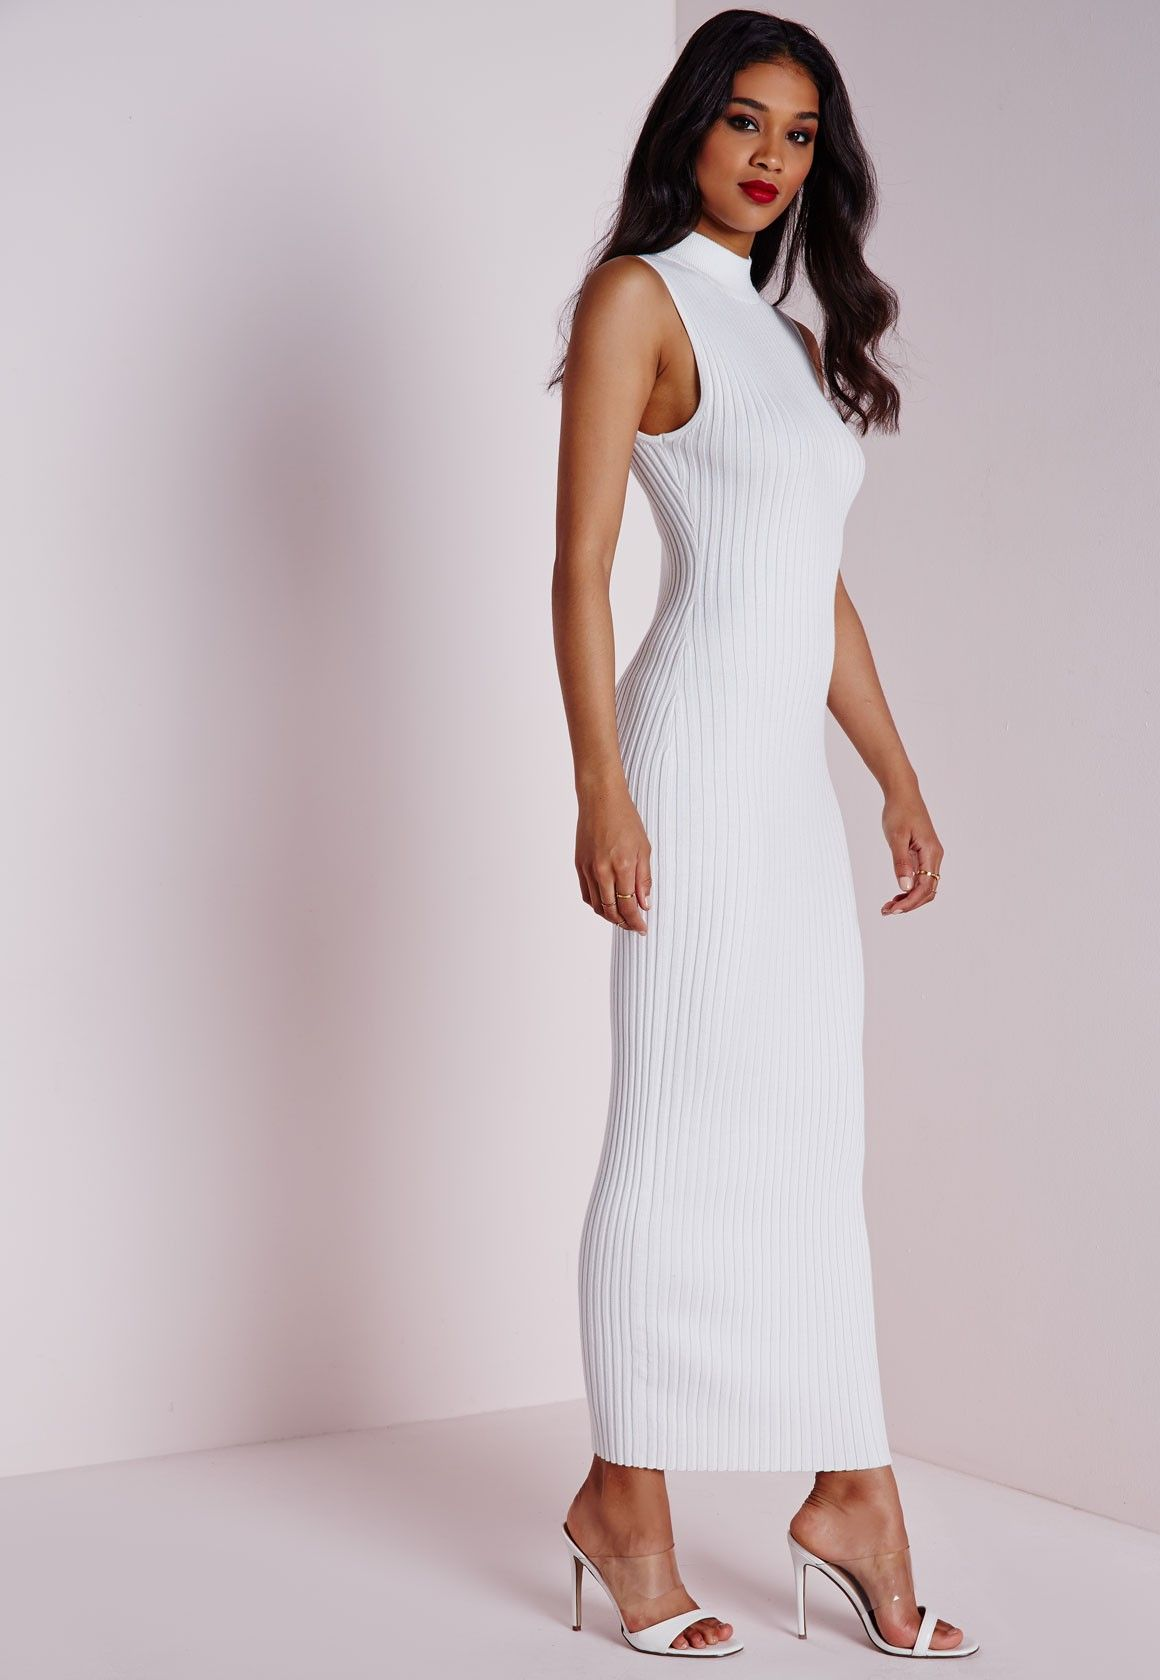 Missguided - Maxi Knitted Rib Dress White   Womenswear   Pinterest ...